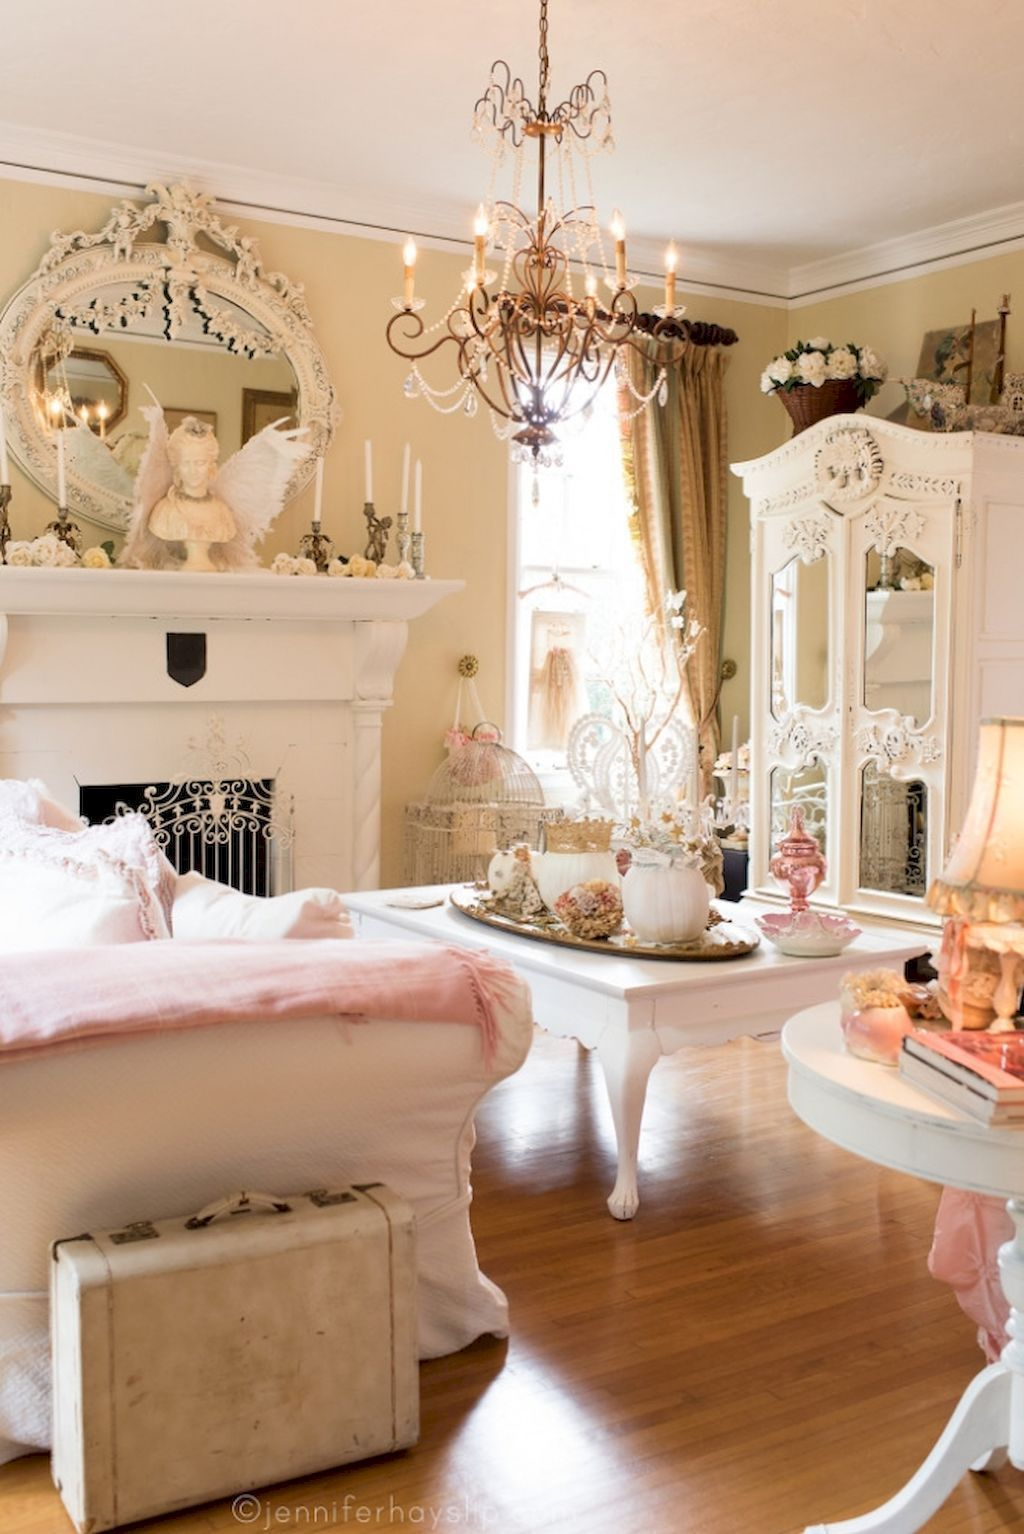 Shabby chic living room decor ideas (30) | Shabby chic ...